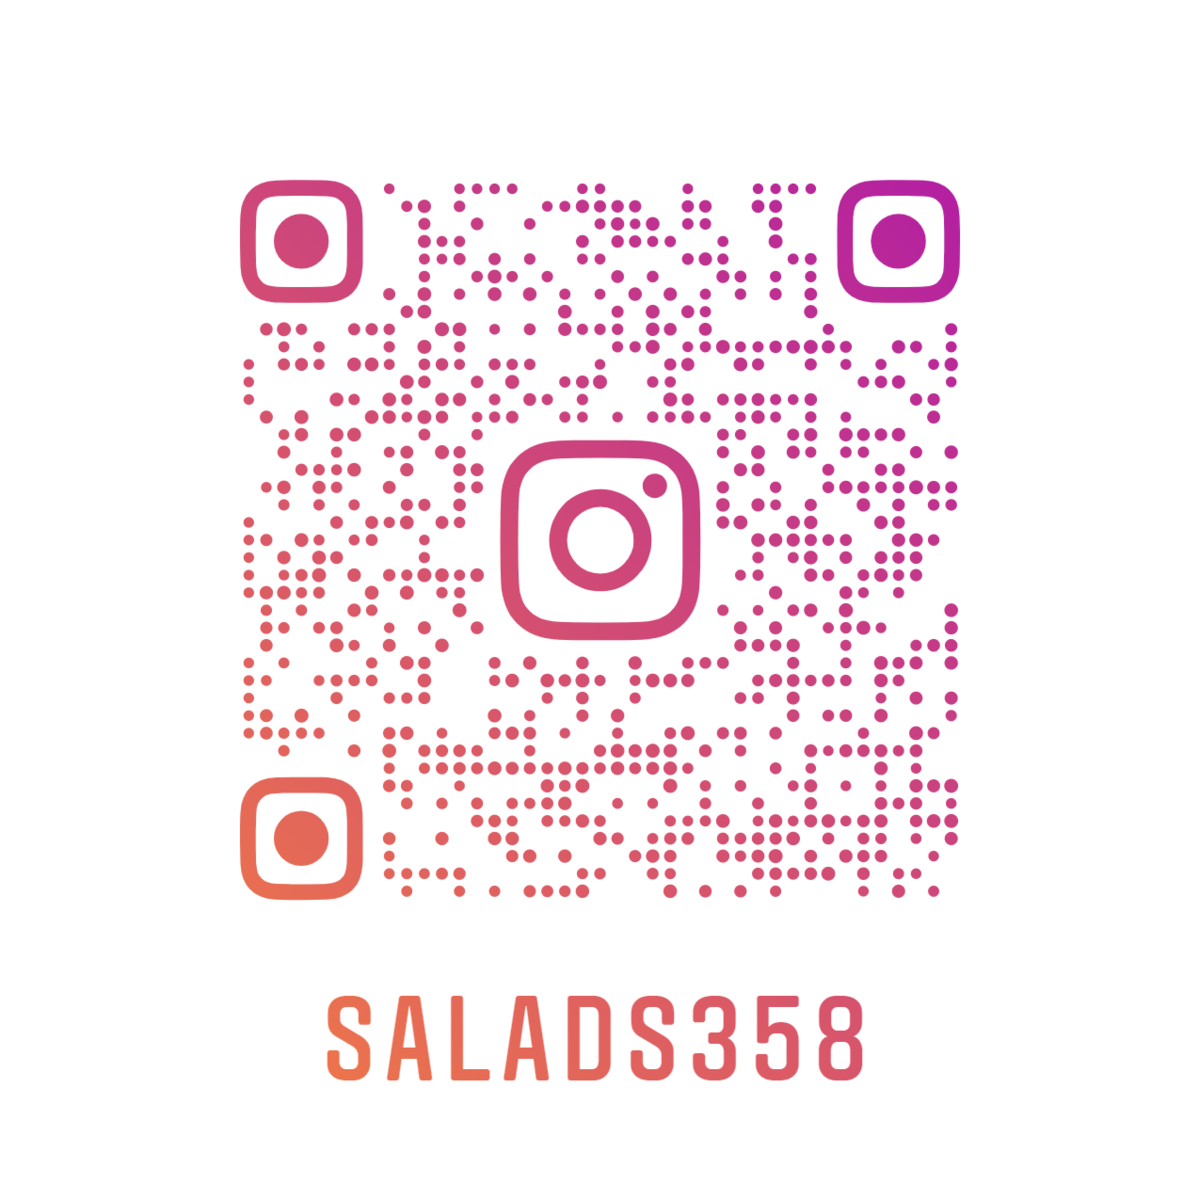 f:id:salads358:20210518110644p:plain